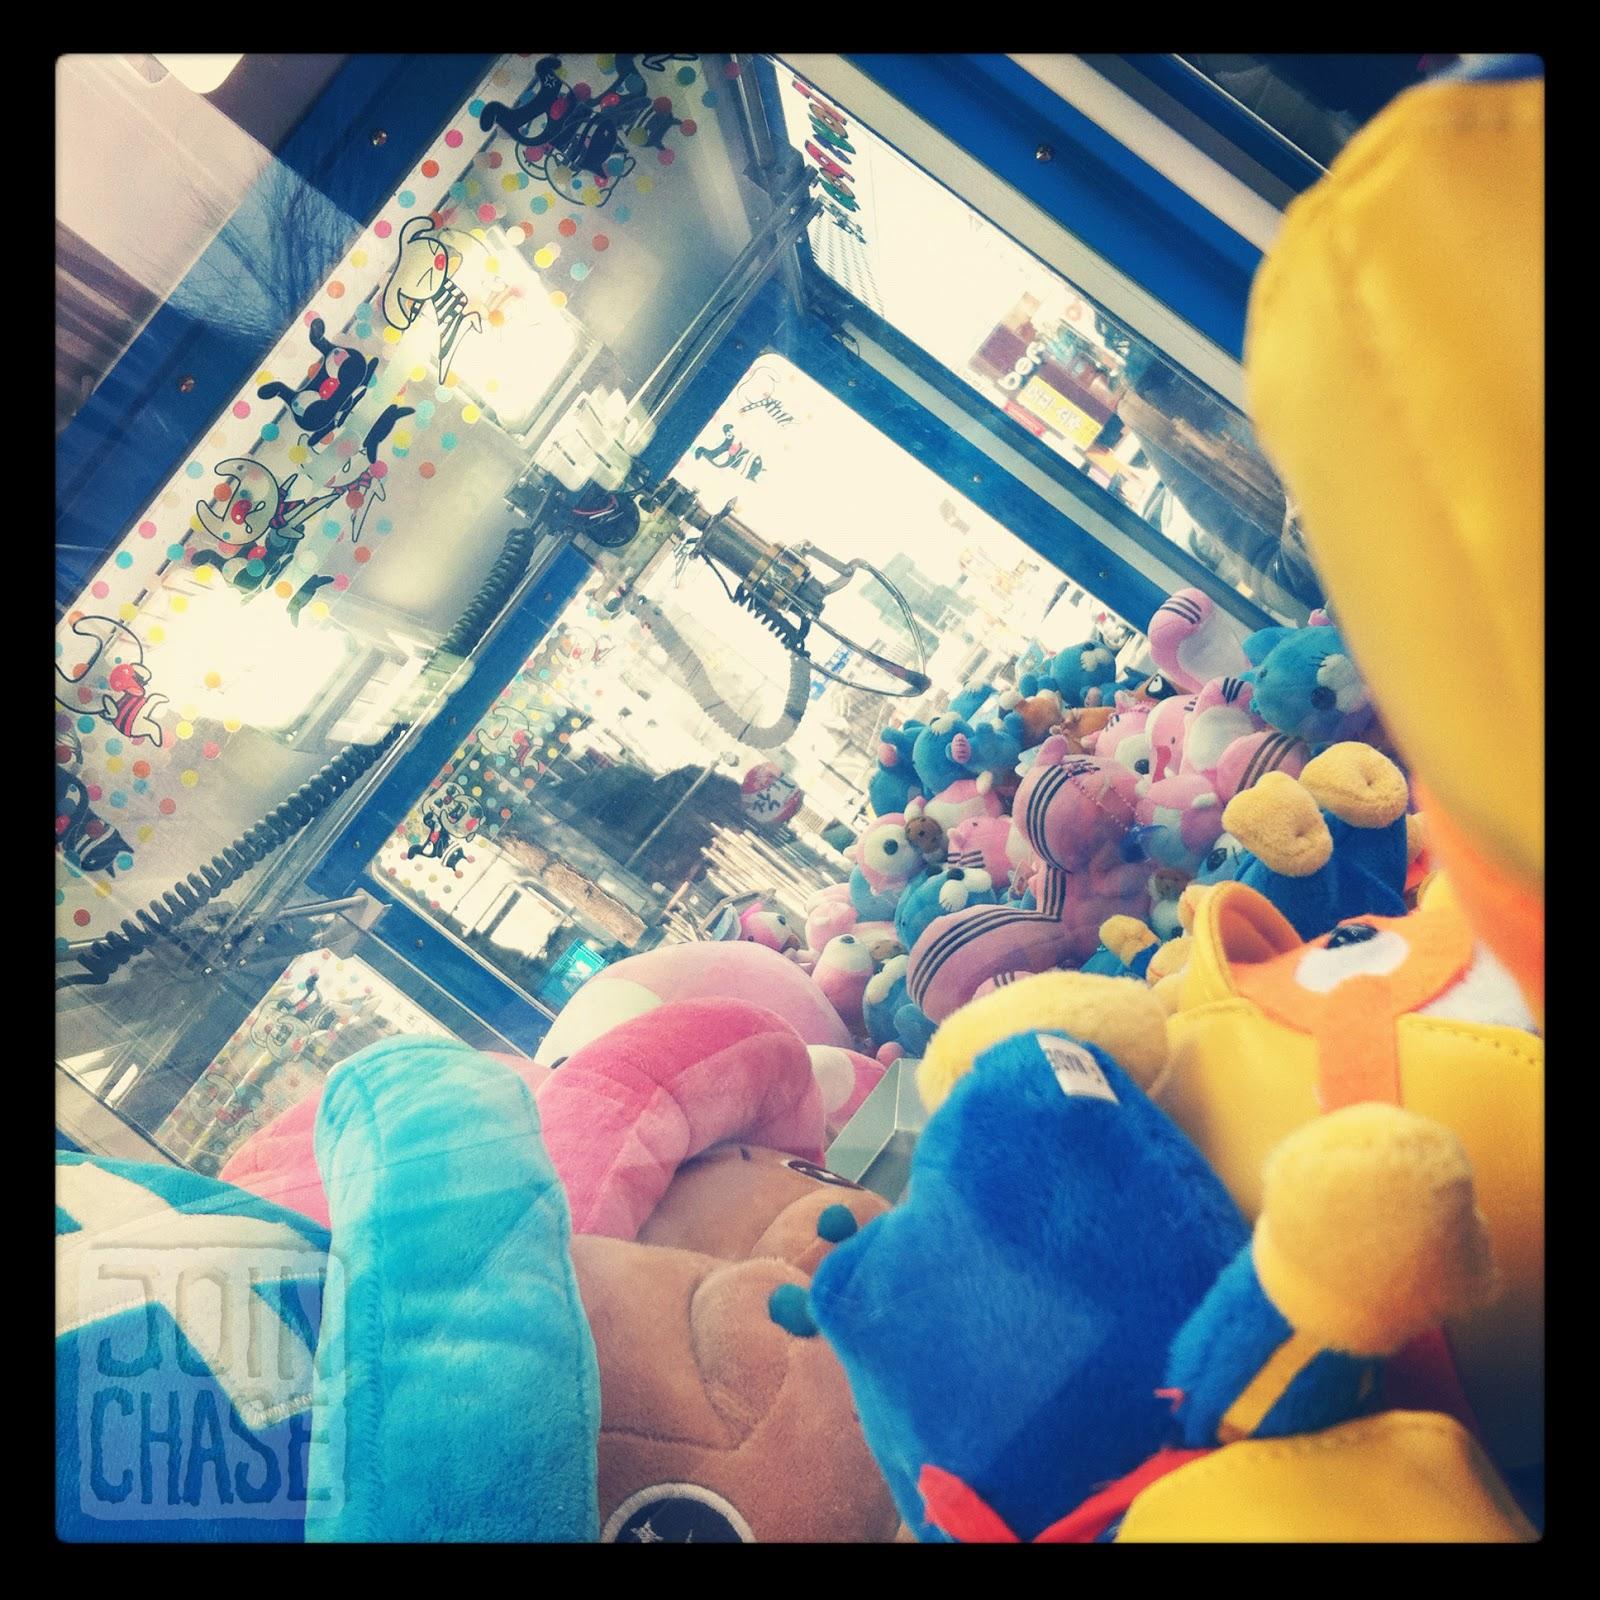 claw machine stuffed animals for sale